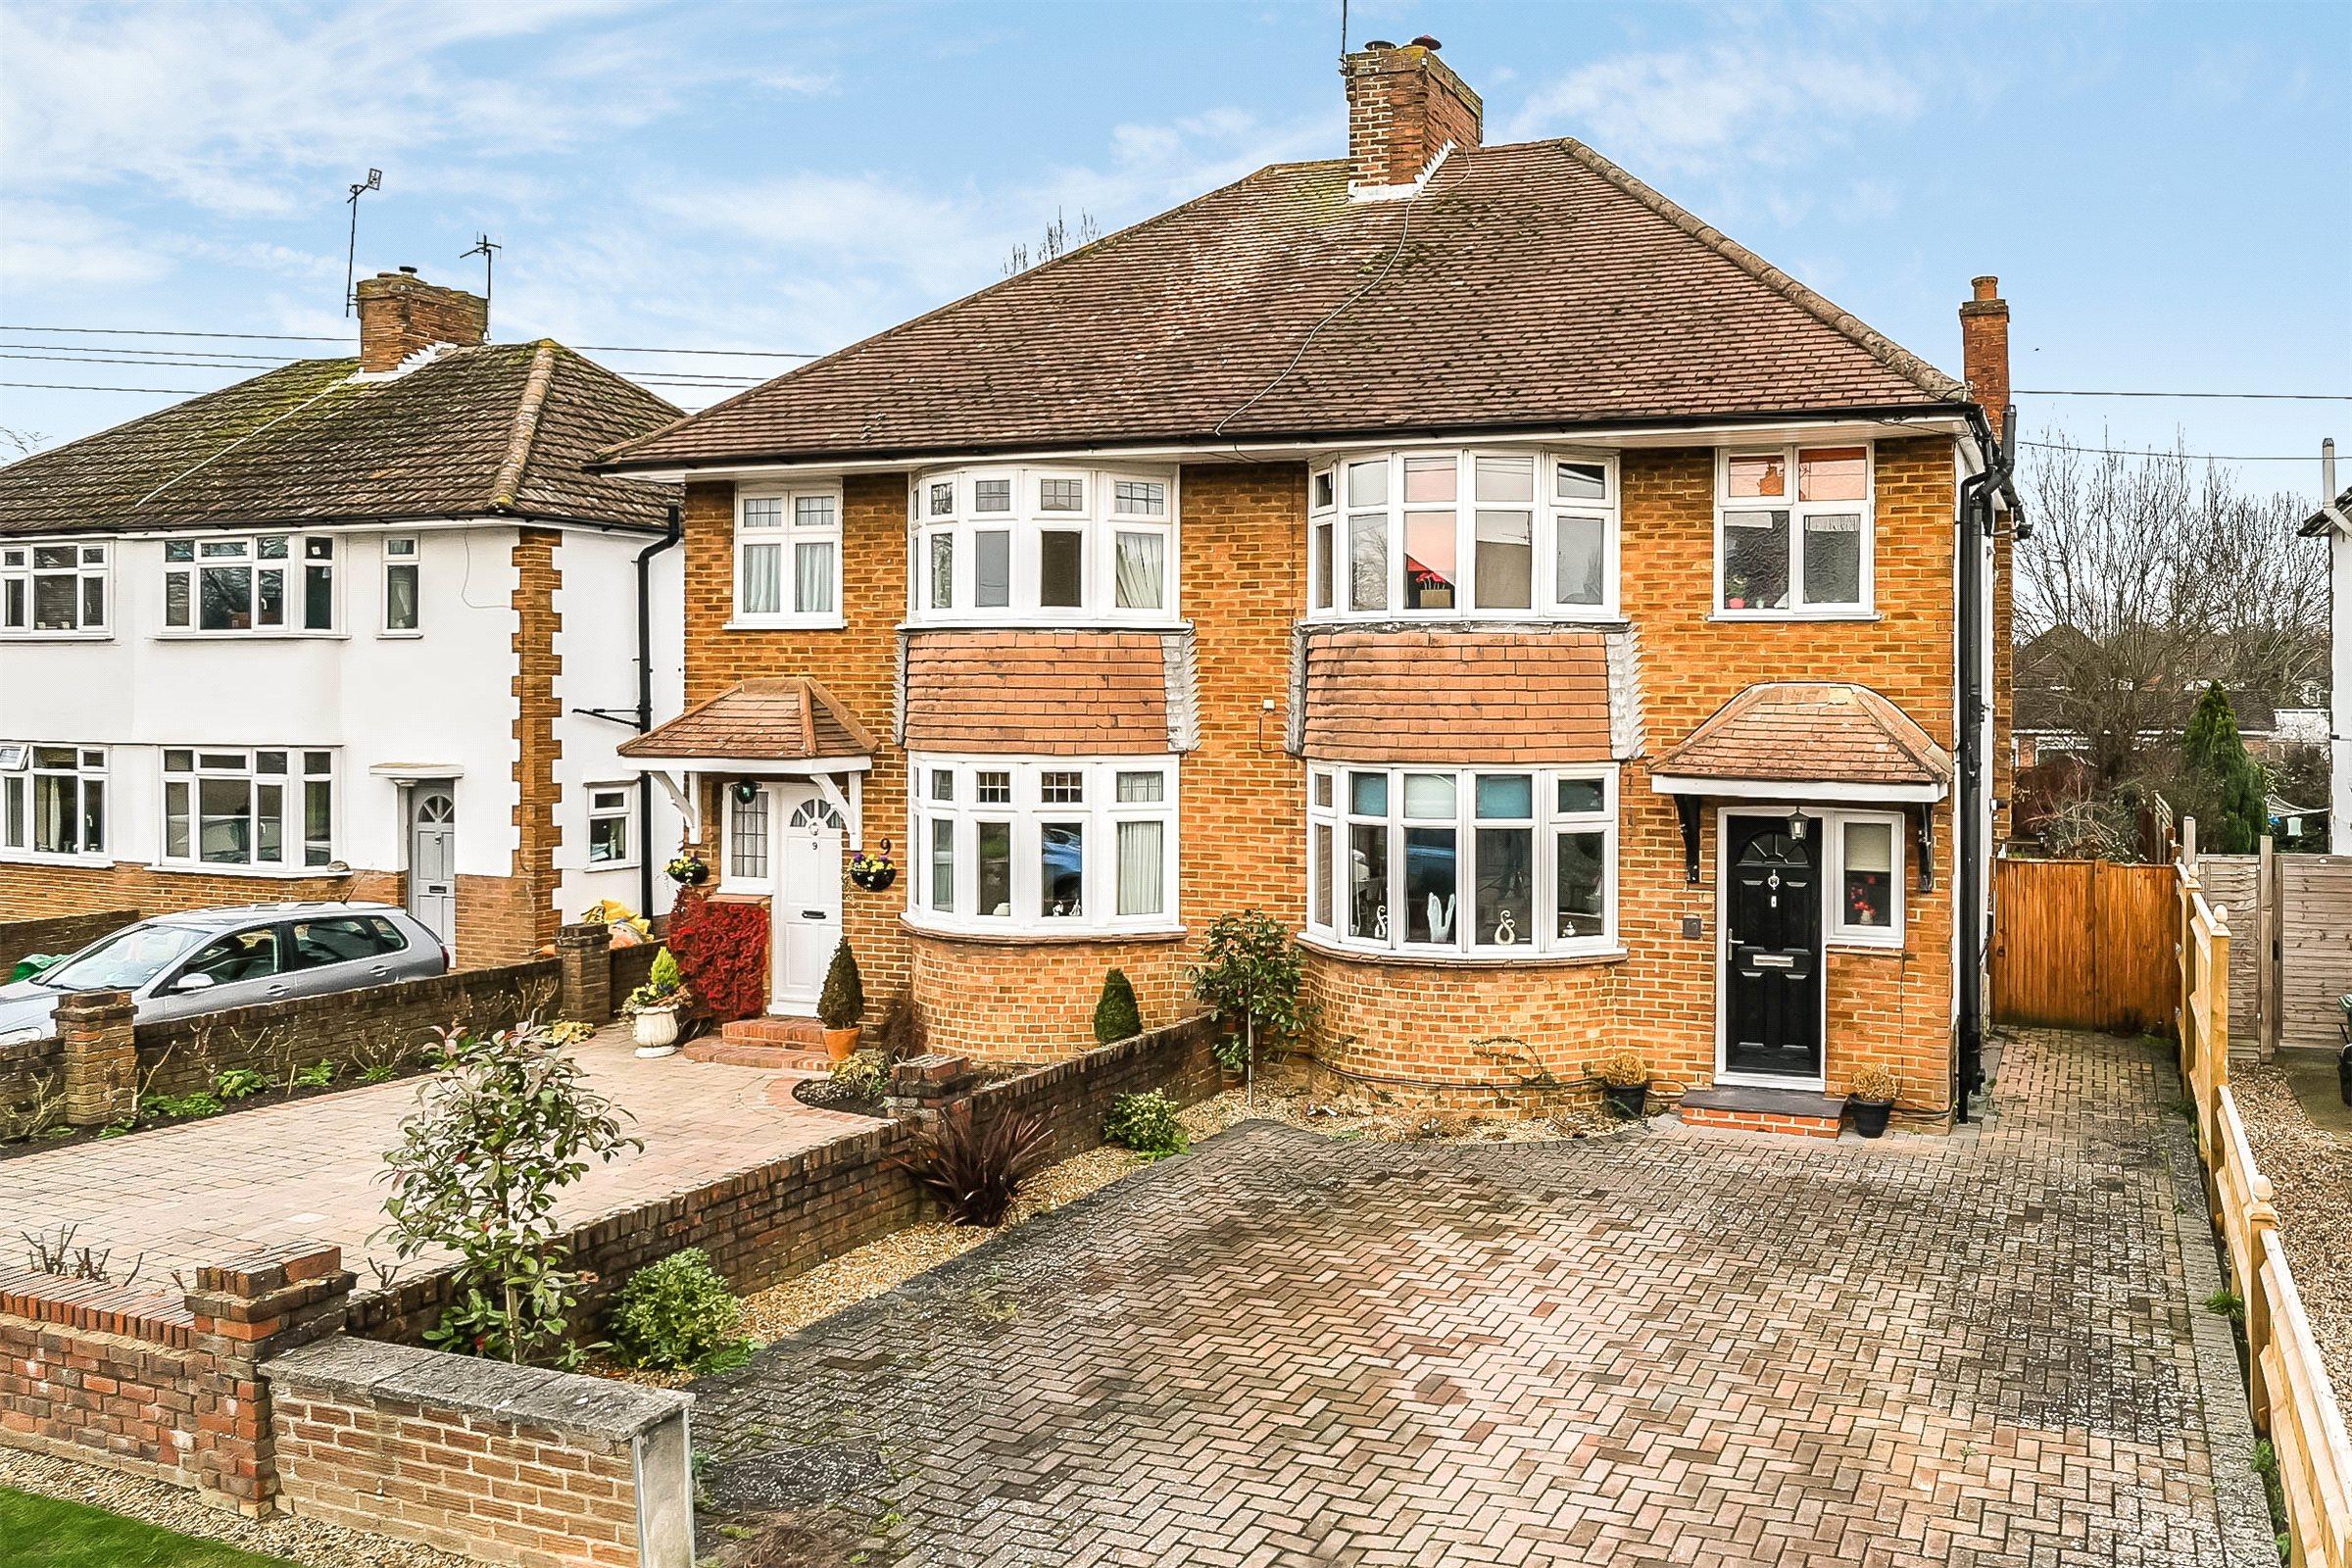 3 Bedrooms Semi Detached House for sale in Parkway, Horley, Surrey, RH6